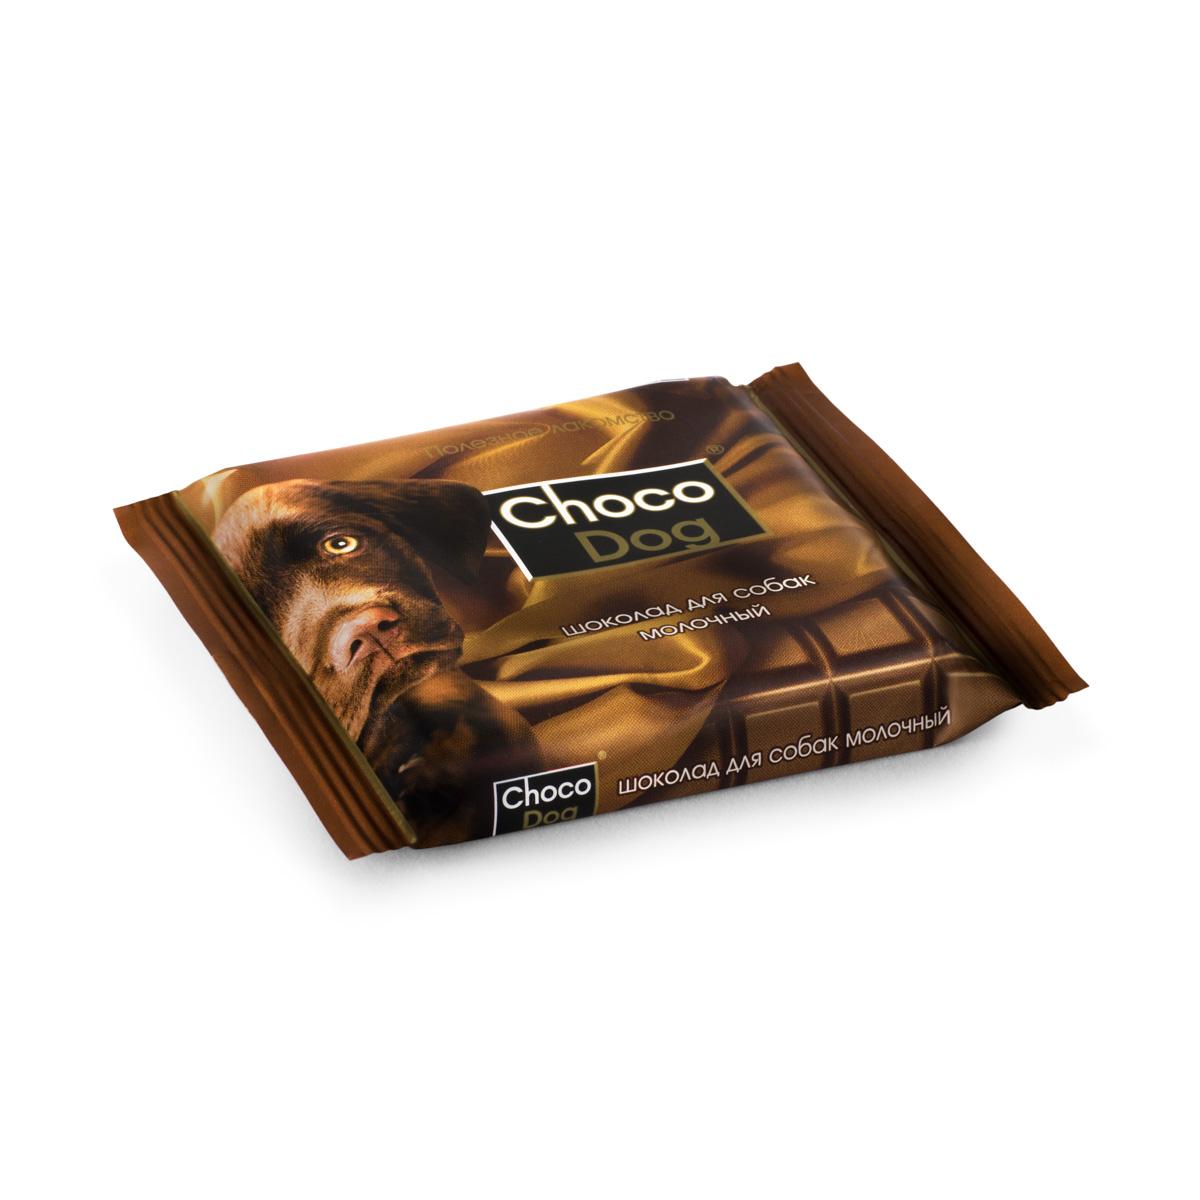 Choco Dog шоколад молочный лакомство для собак, 15г